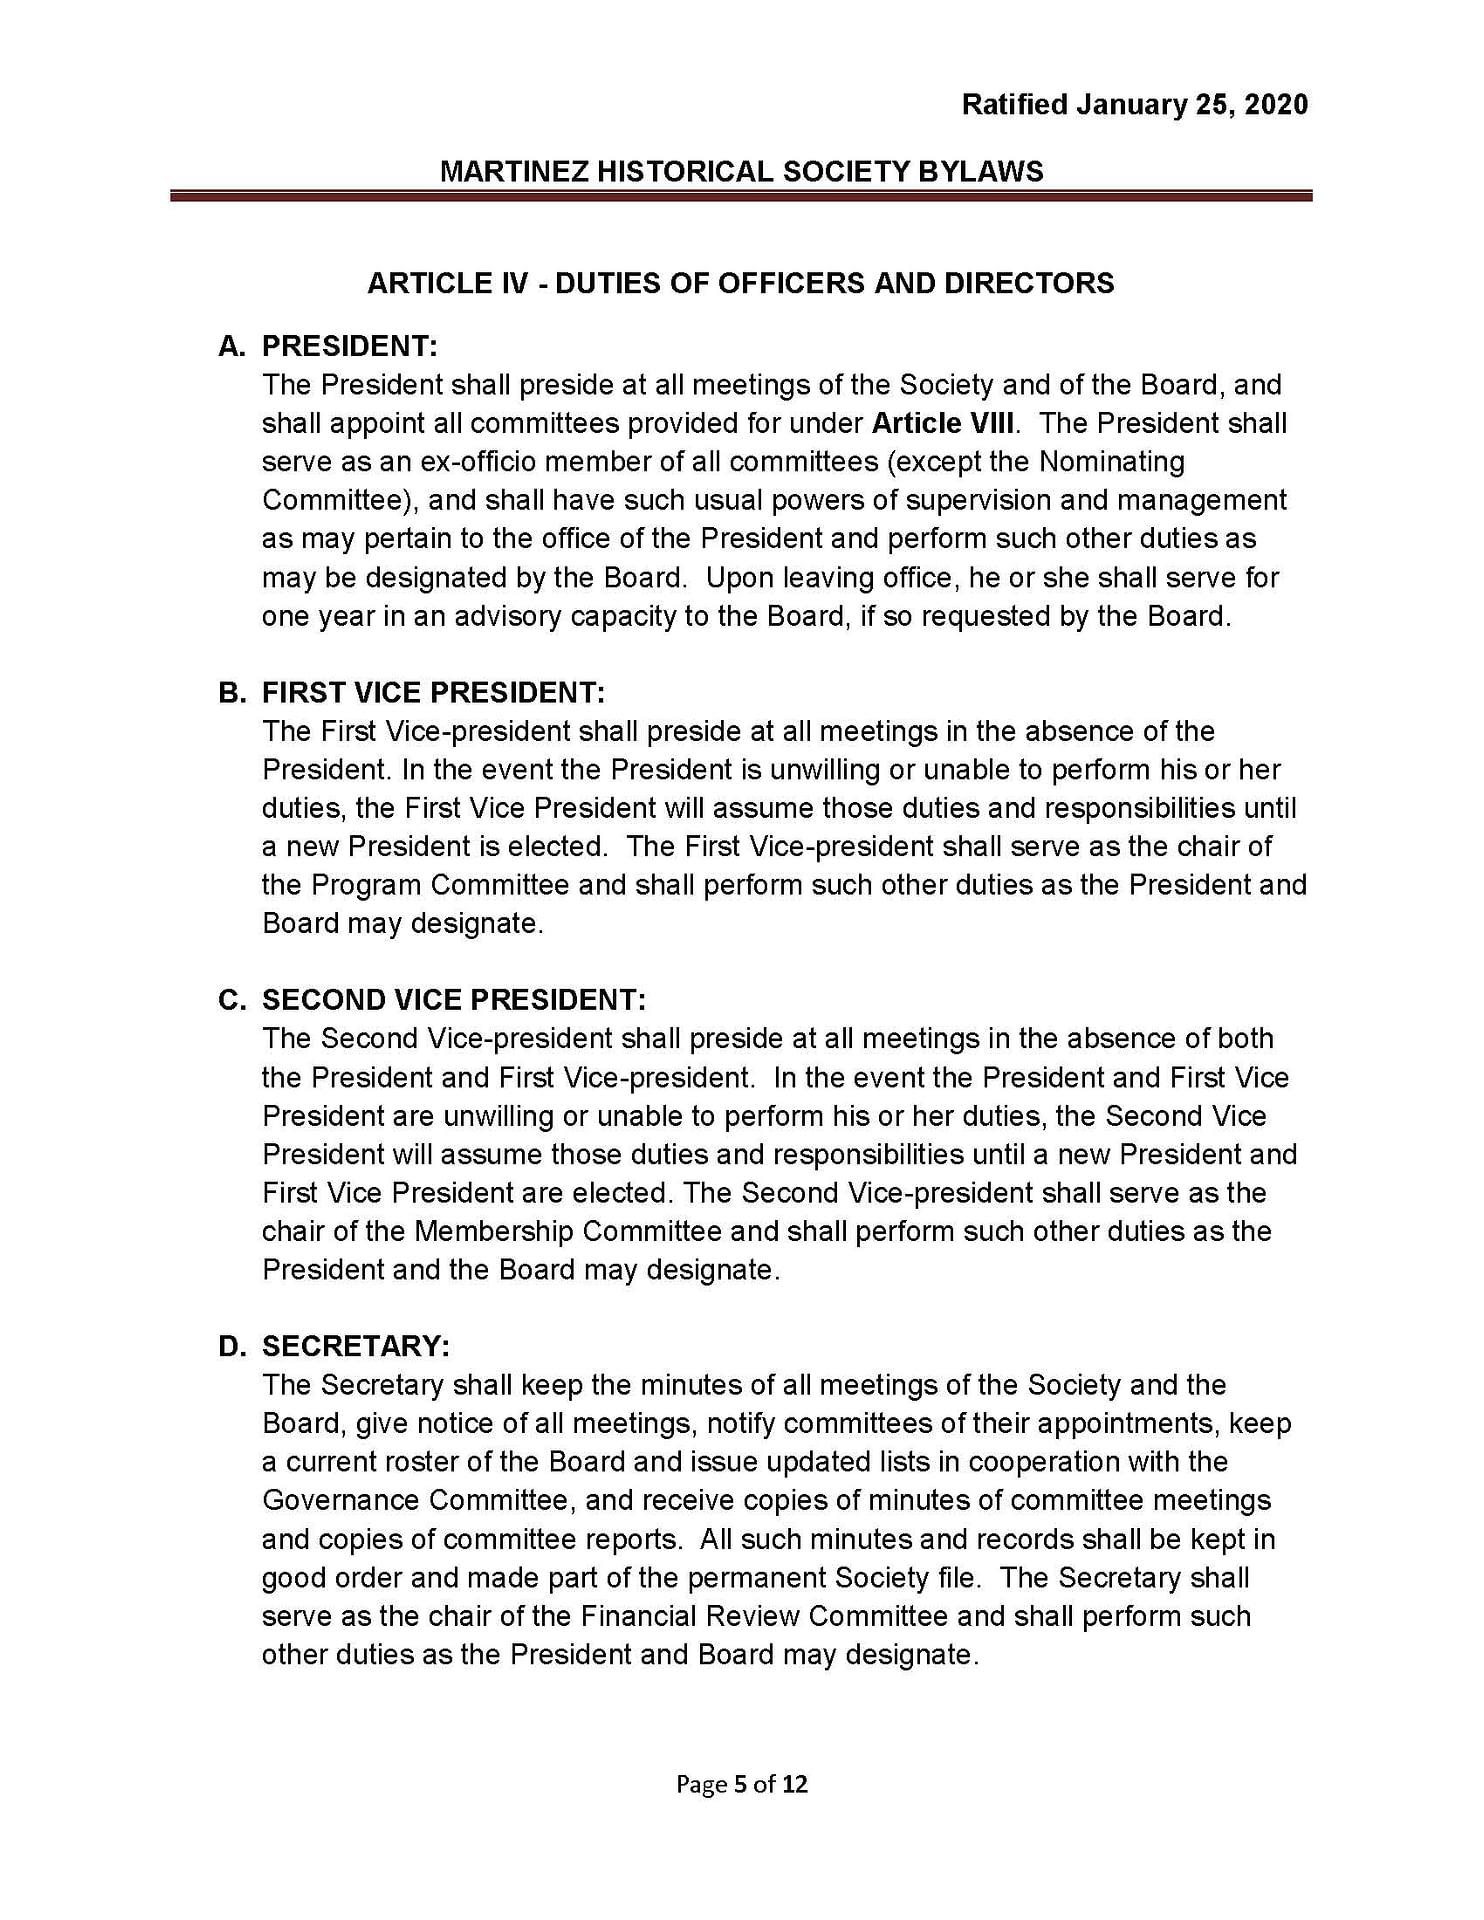 MHS Bylaws Rev 2020-01_Page_05